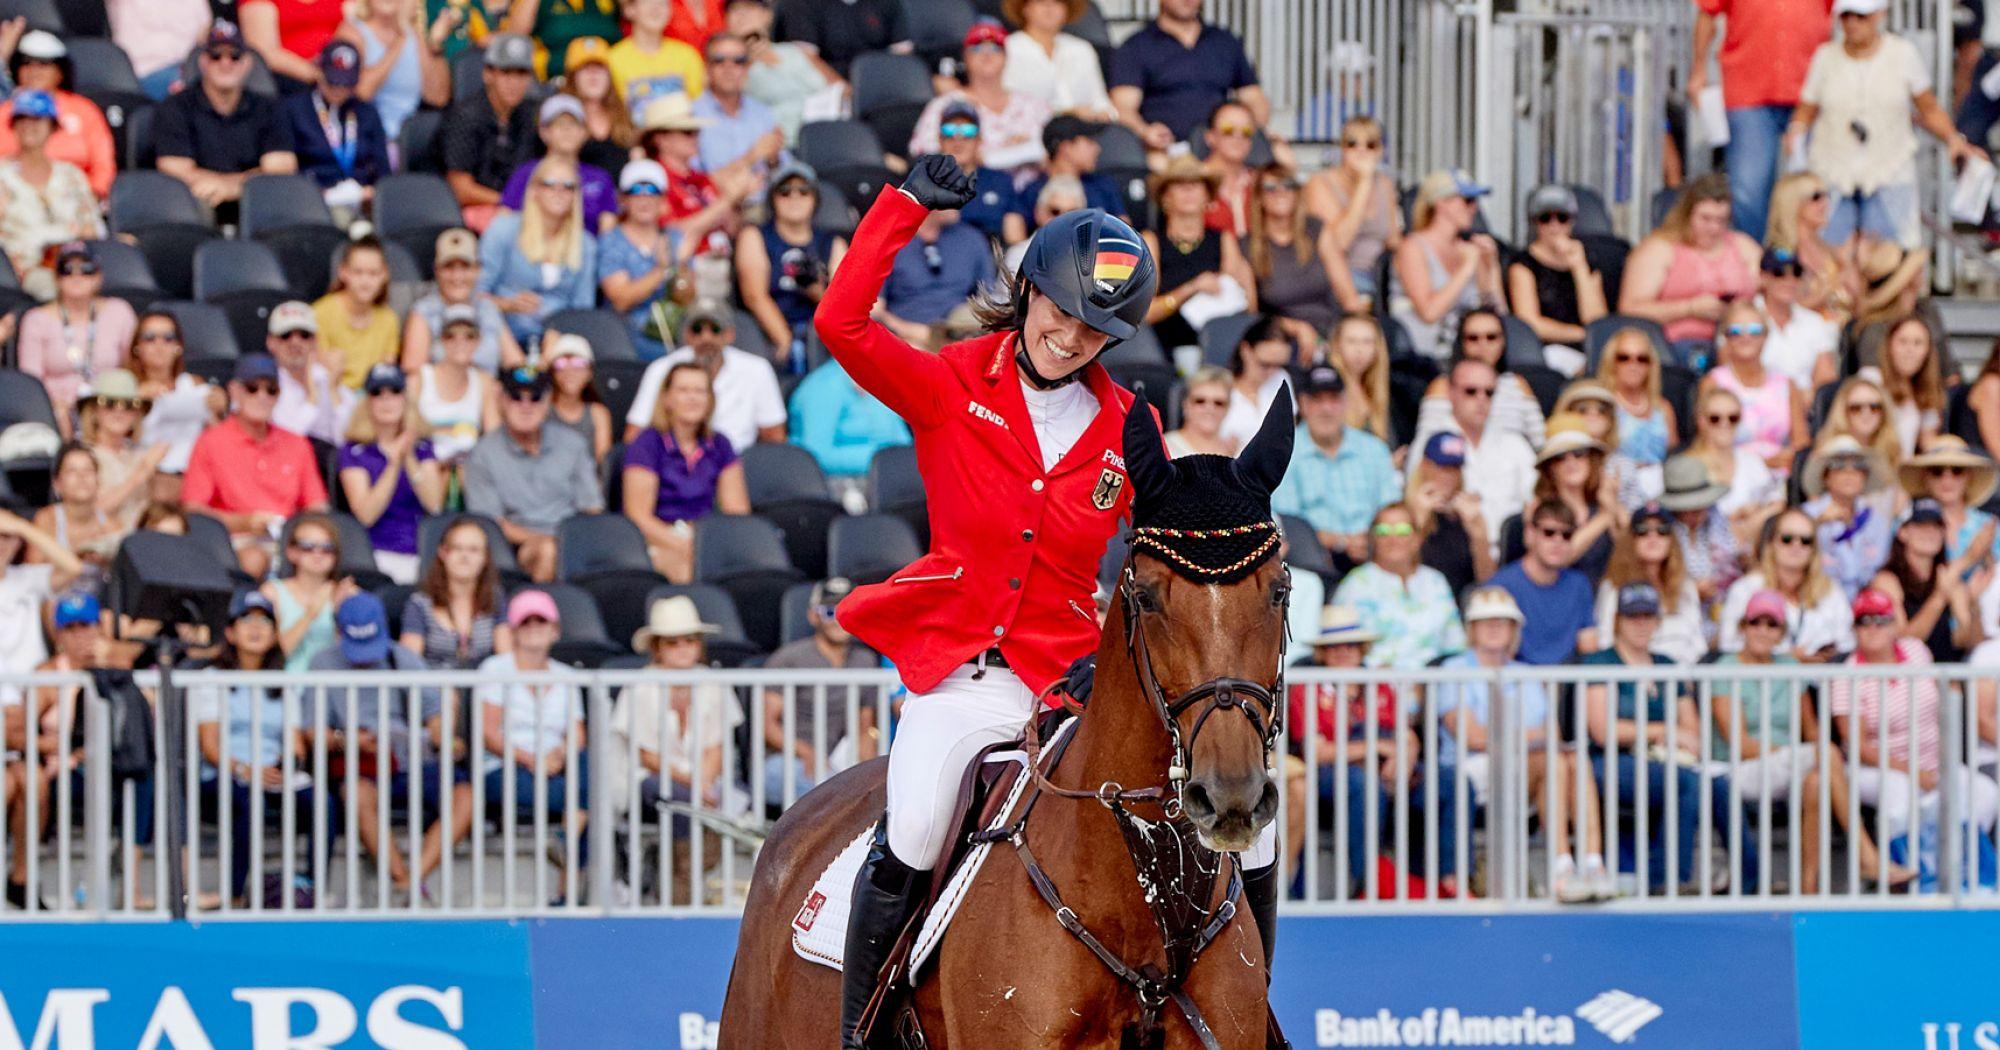 Event Fei World Equestrian Games 2018